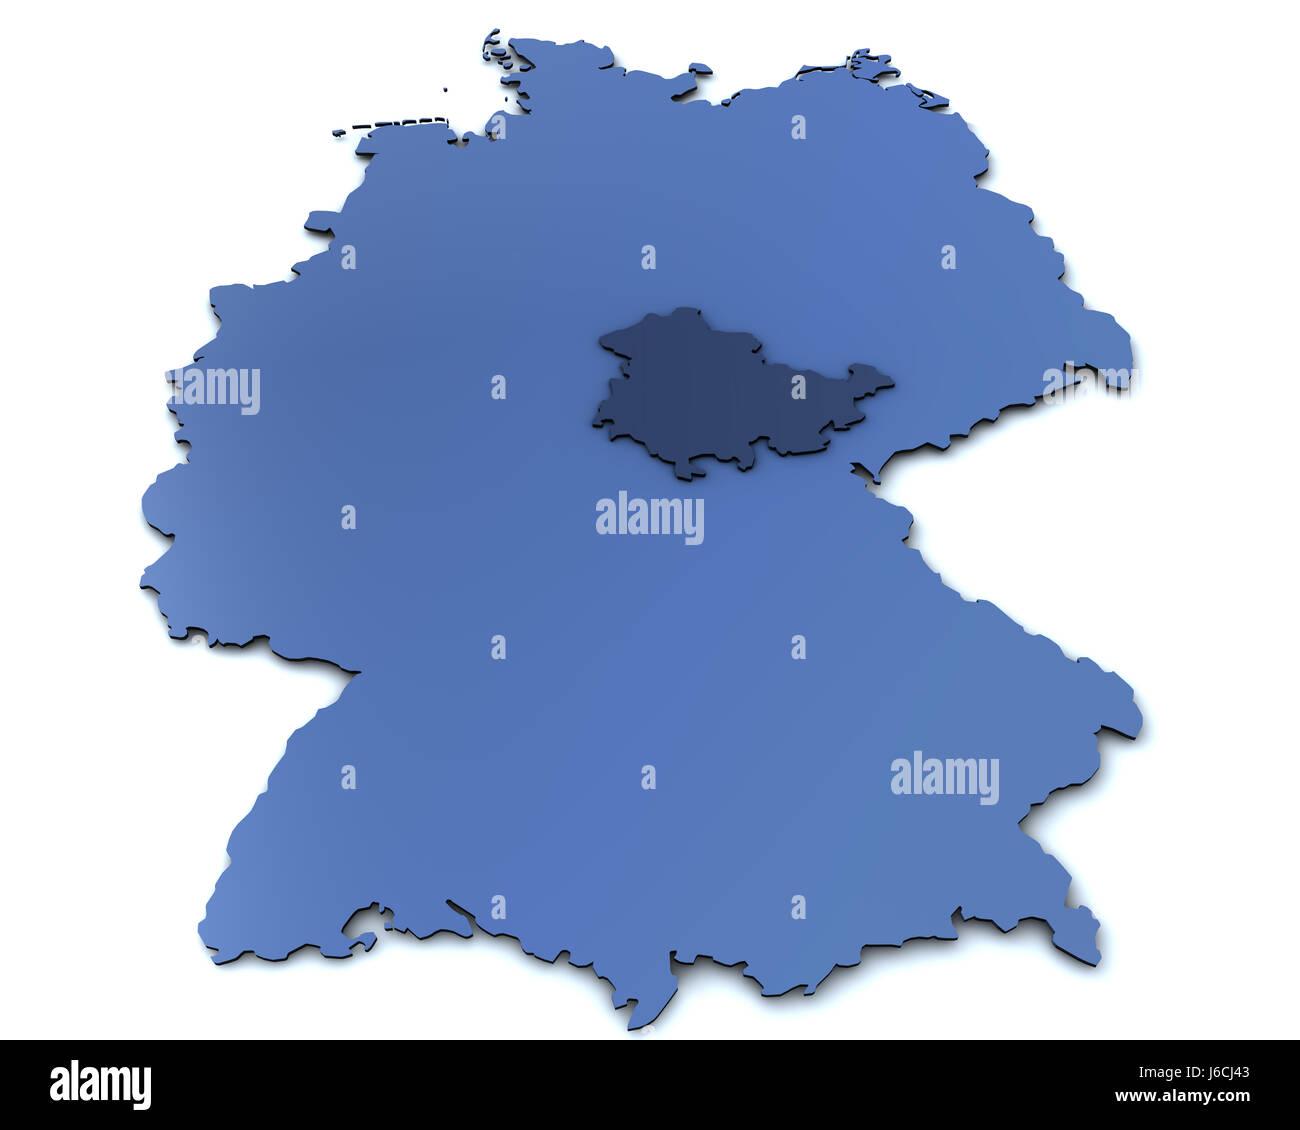 Carte Allemagne Thuringe.Carte De L Allemagne Thuringe Banque D Images Photo Stock